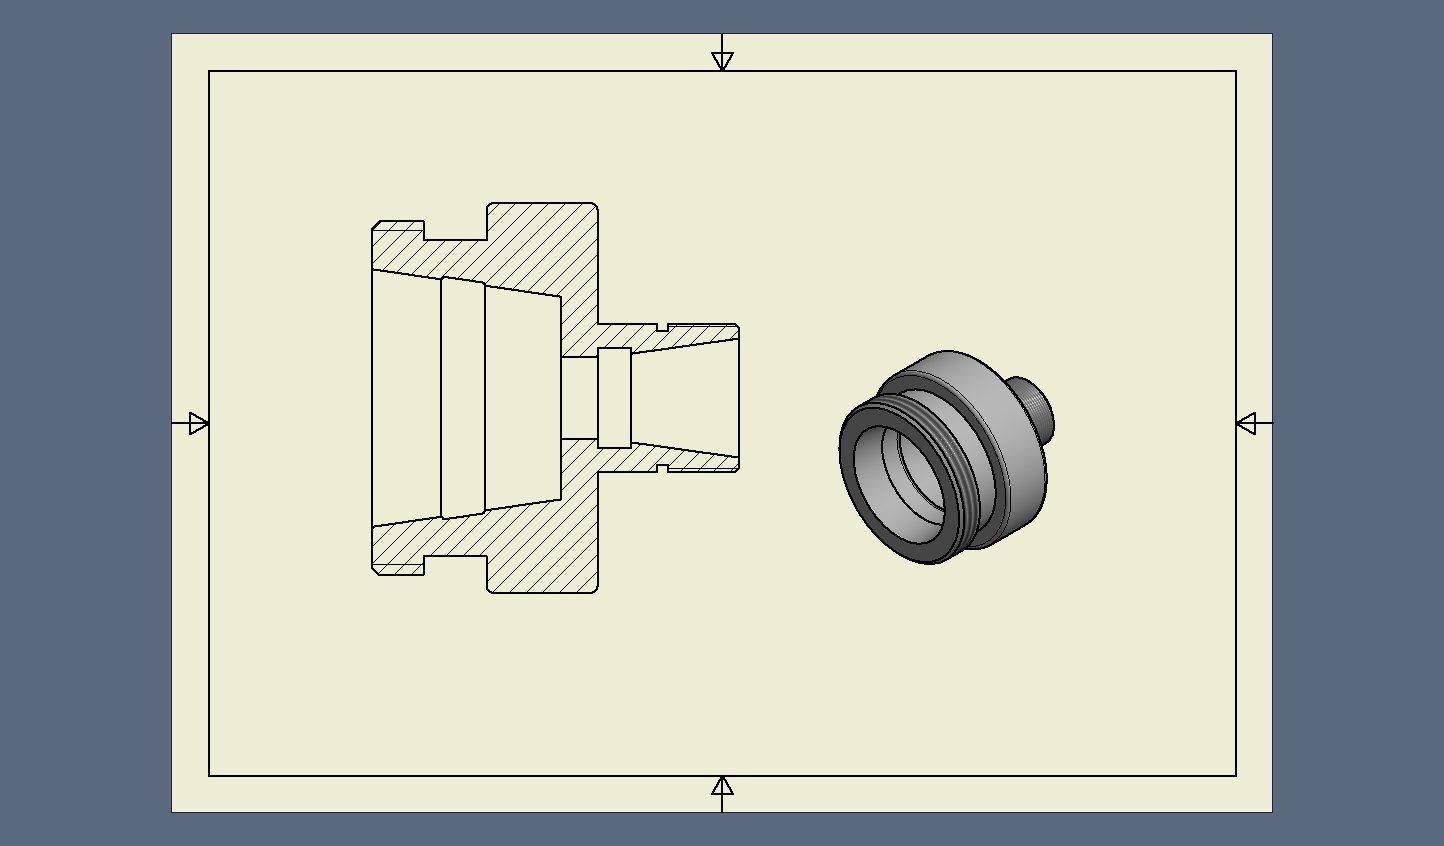 Porte pince ER32 L00(2).jpg